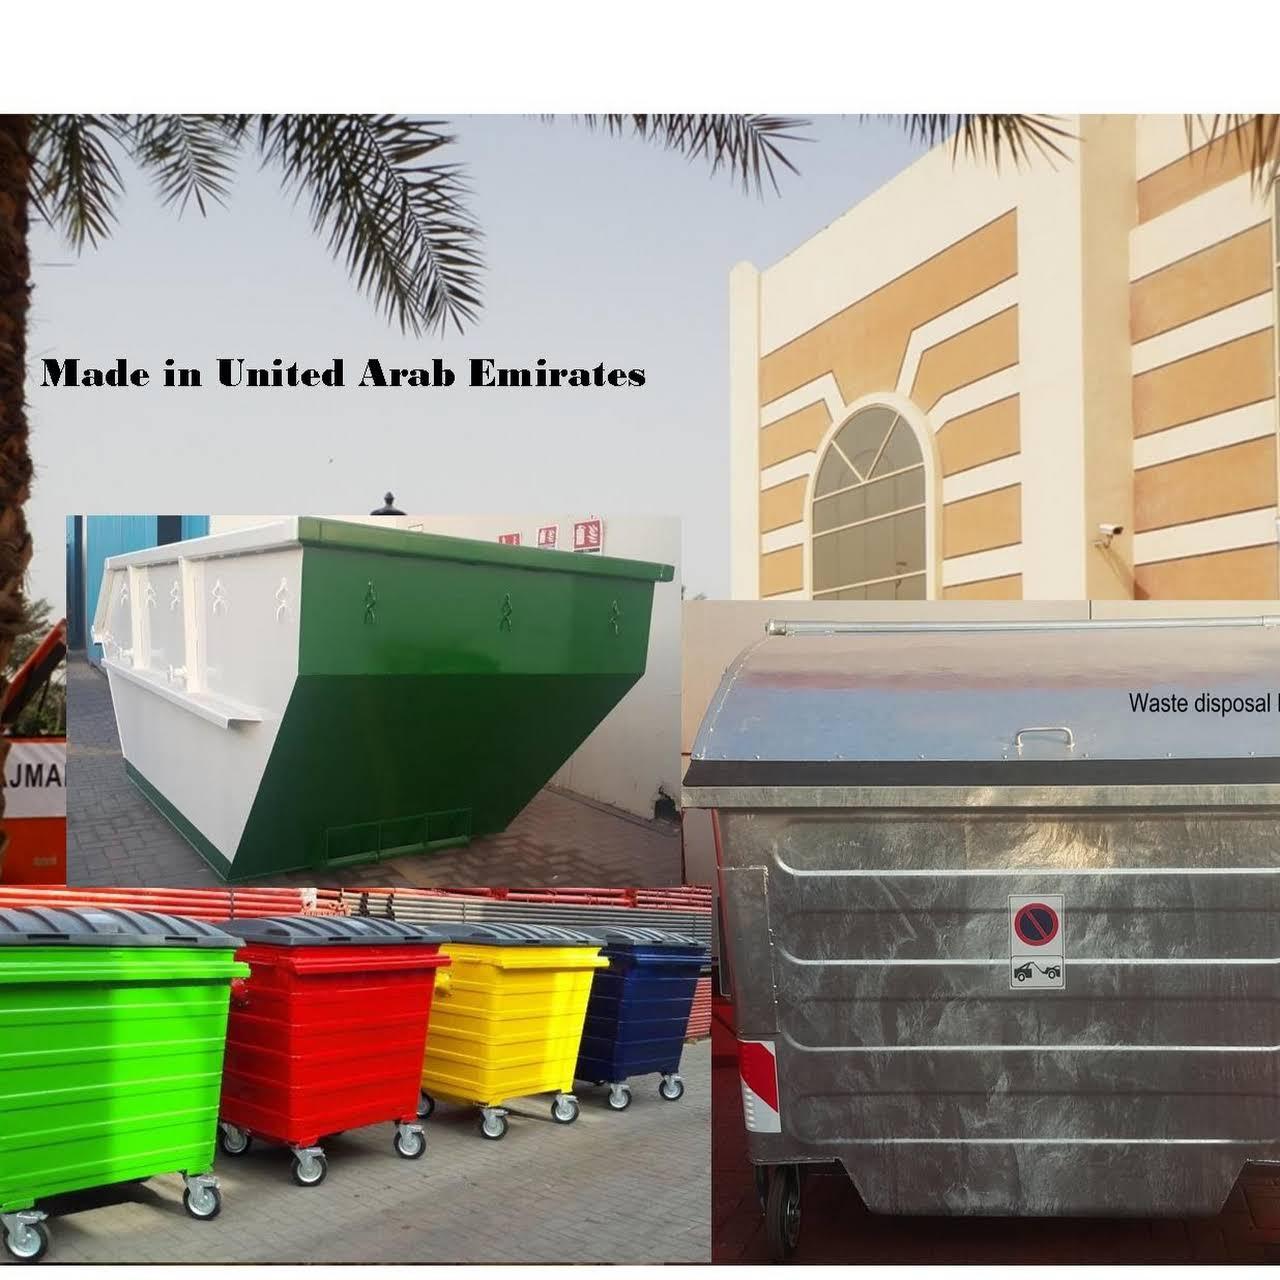 Excel Industry Co  LLC , Ajman, UAE - Under one roof - Waste